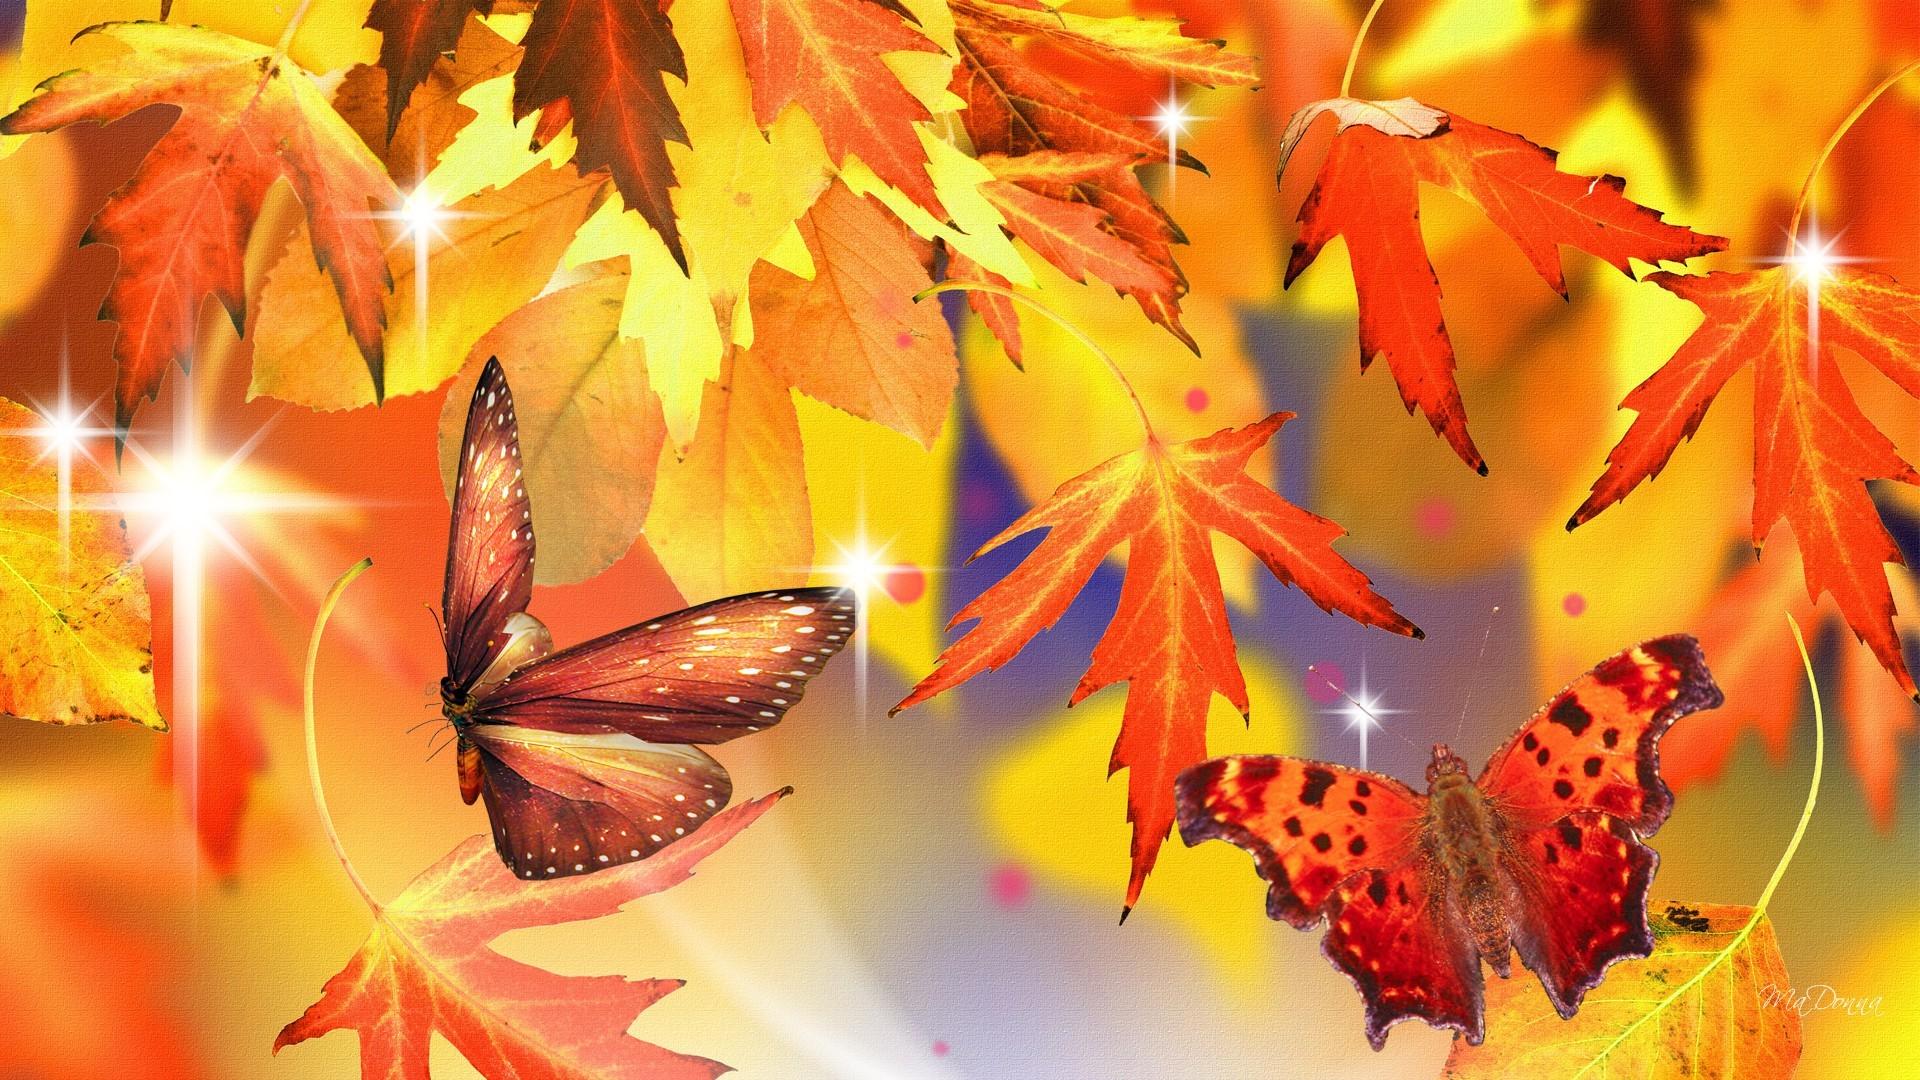 Autumn Leaves and Butterflies HD Wallpaper.